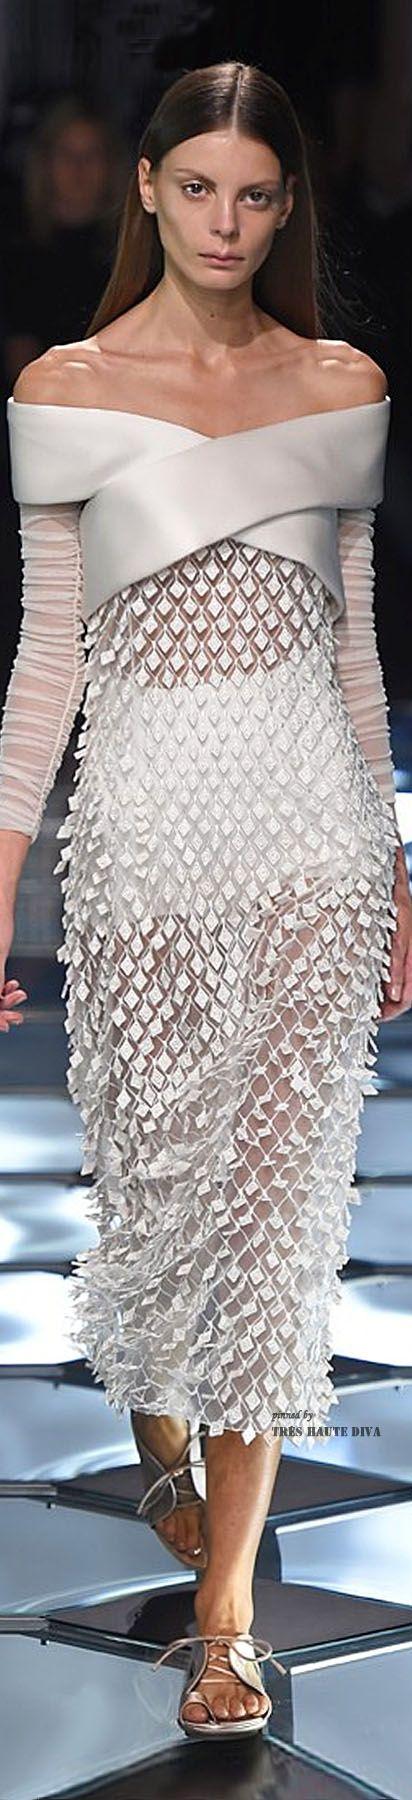 Balenciaga ~ Spring White Satin Off the Shoulder Sheer Maxi Dress w Diamond Shape Embellishments, 2015